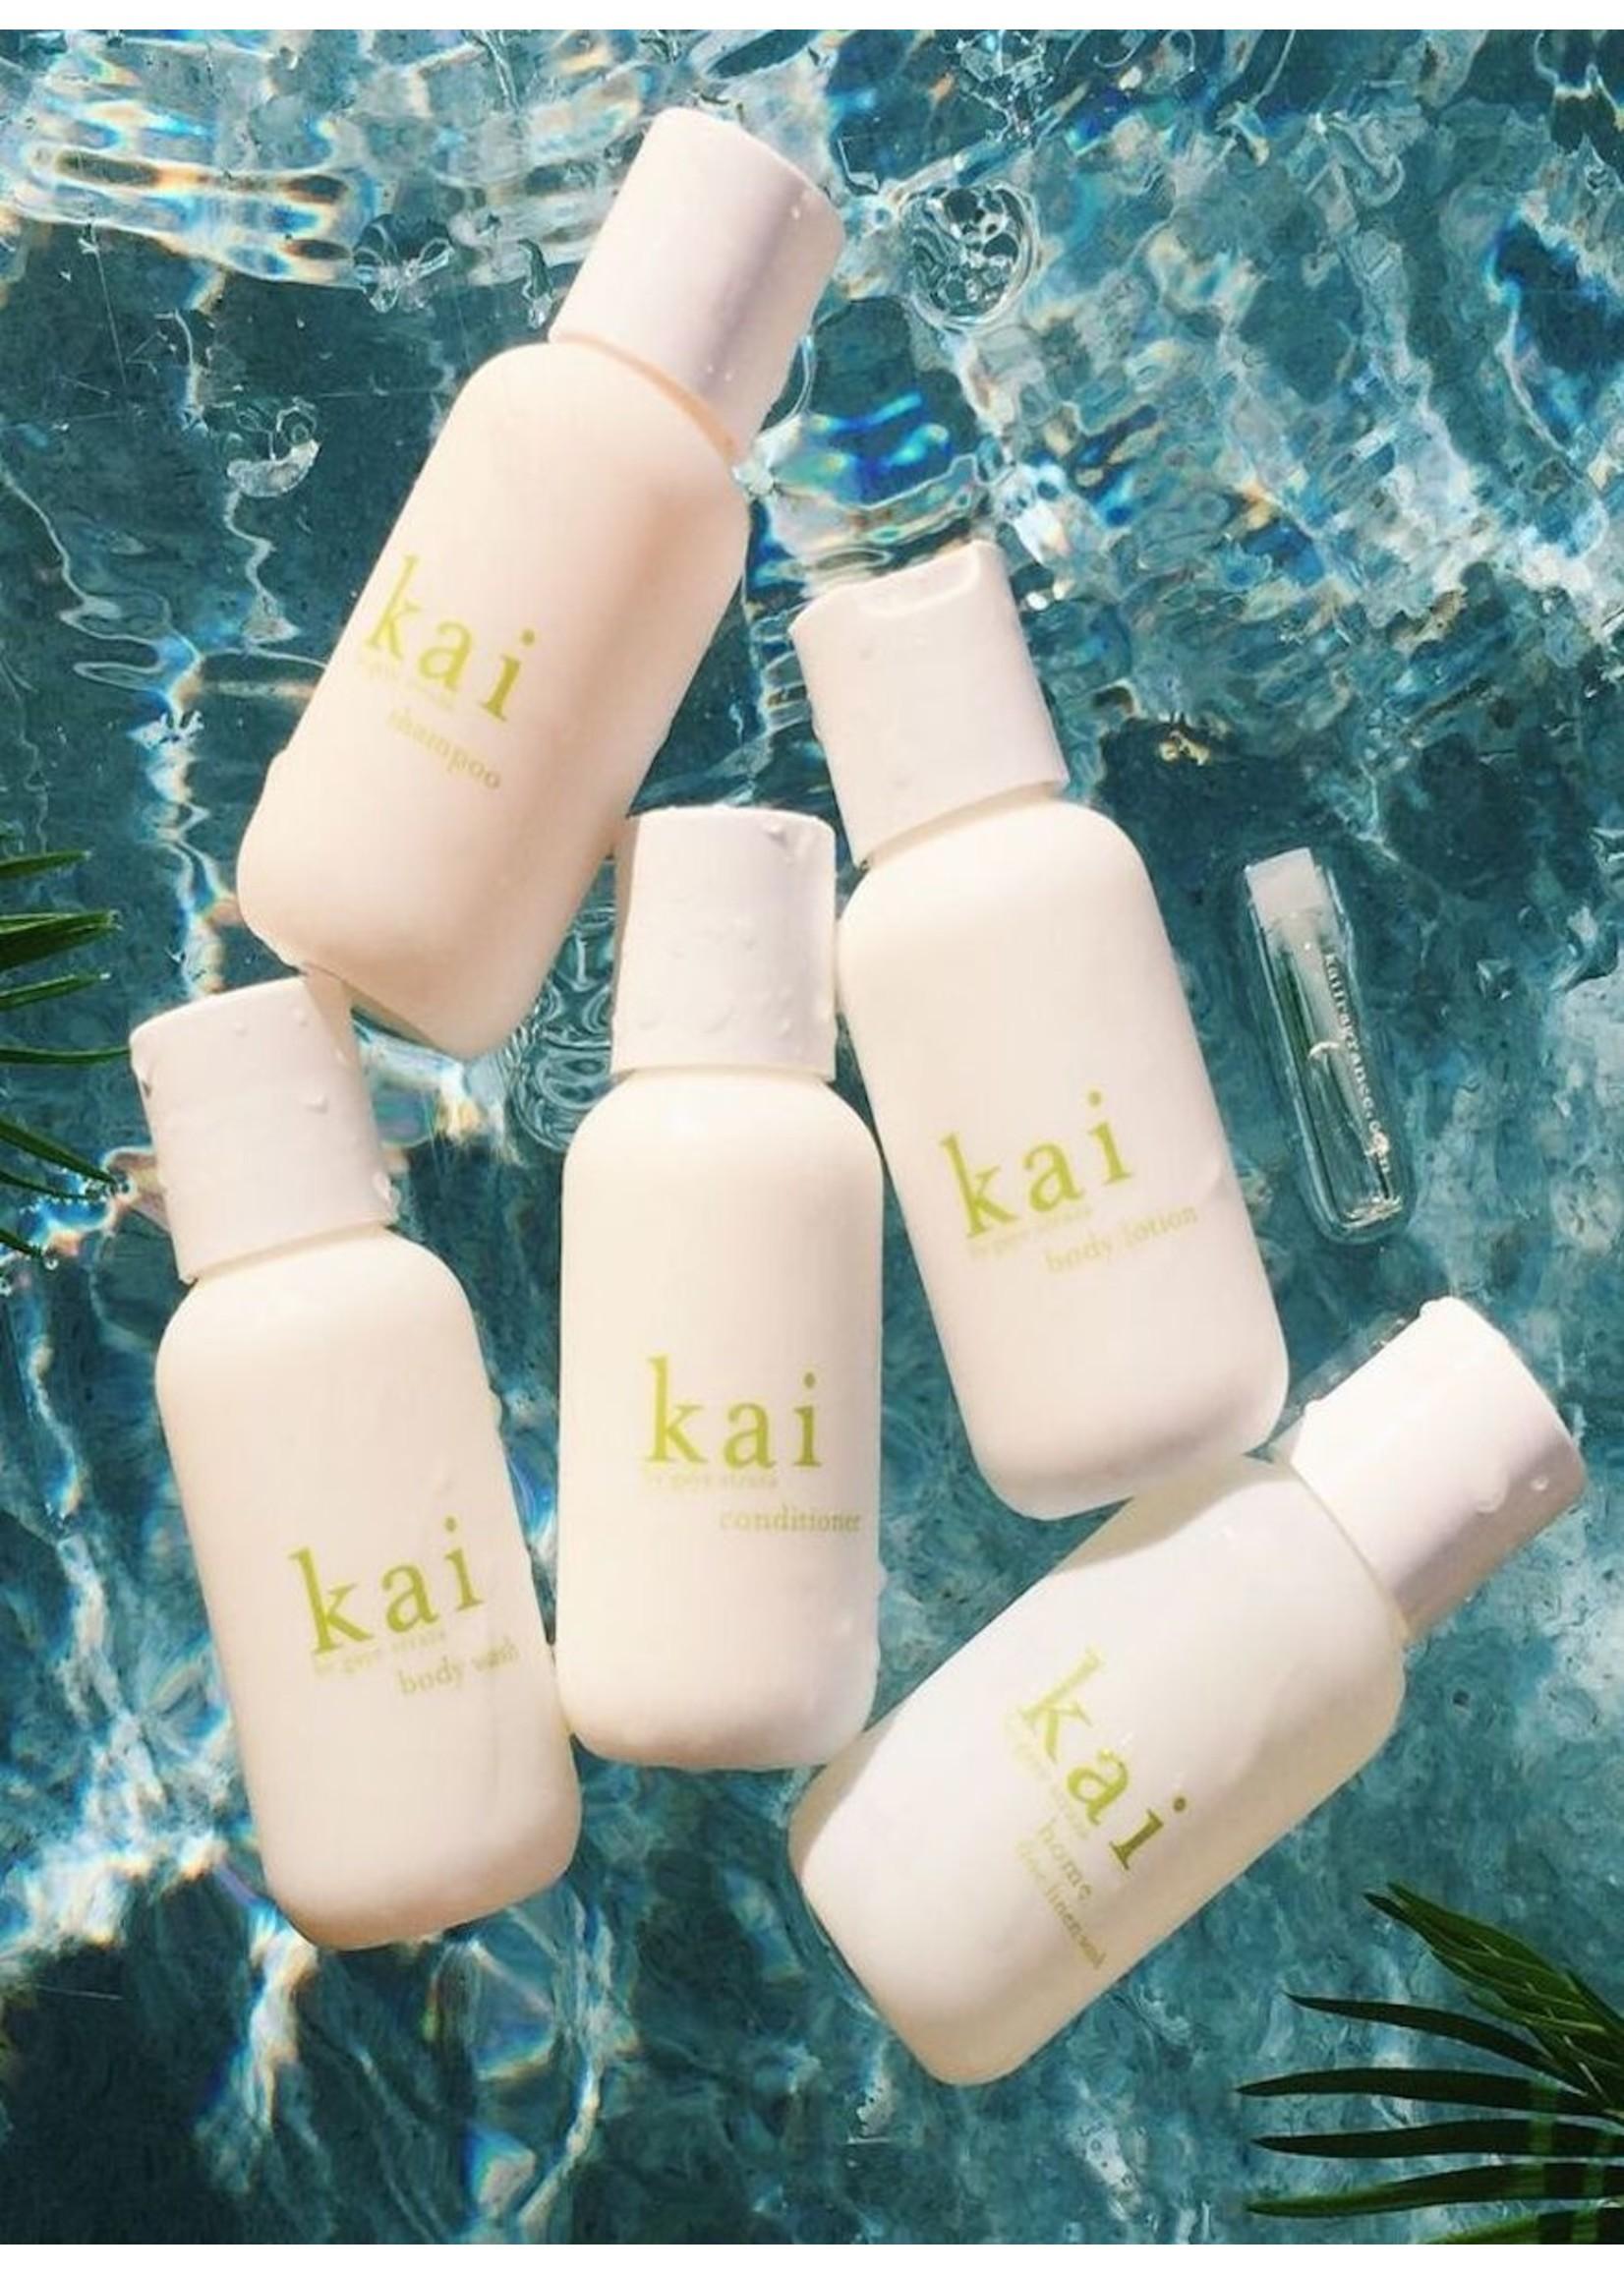 Kai Fragrance Gardenia Body Products